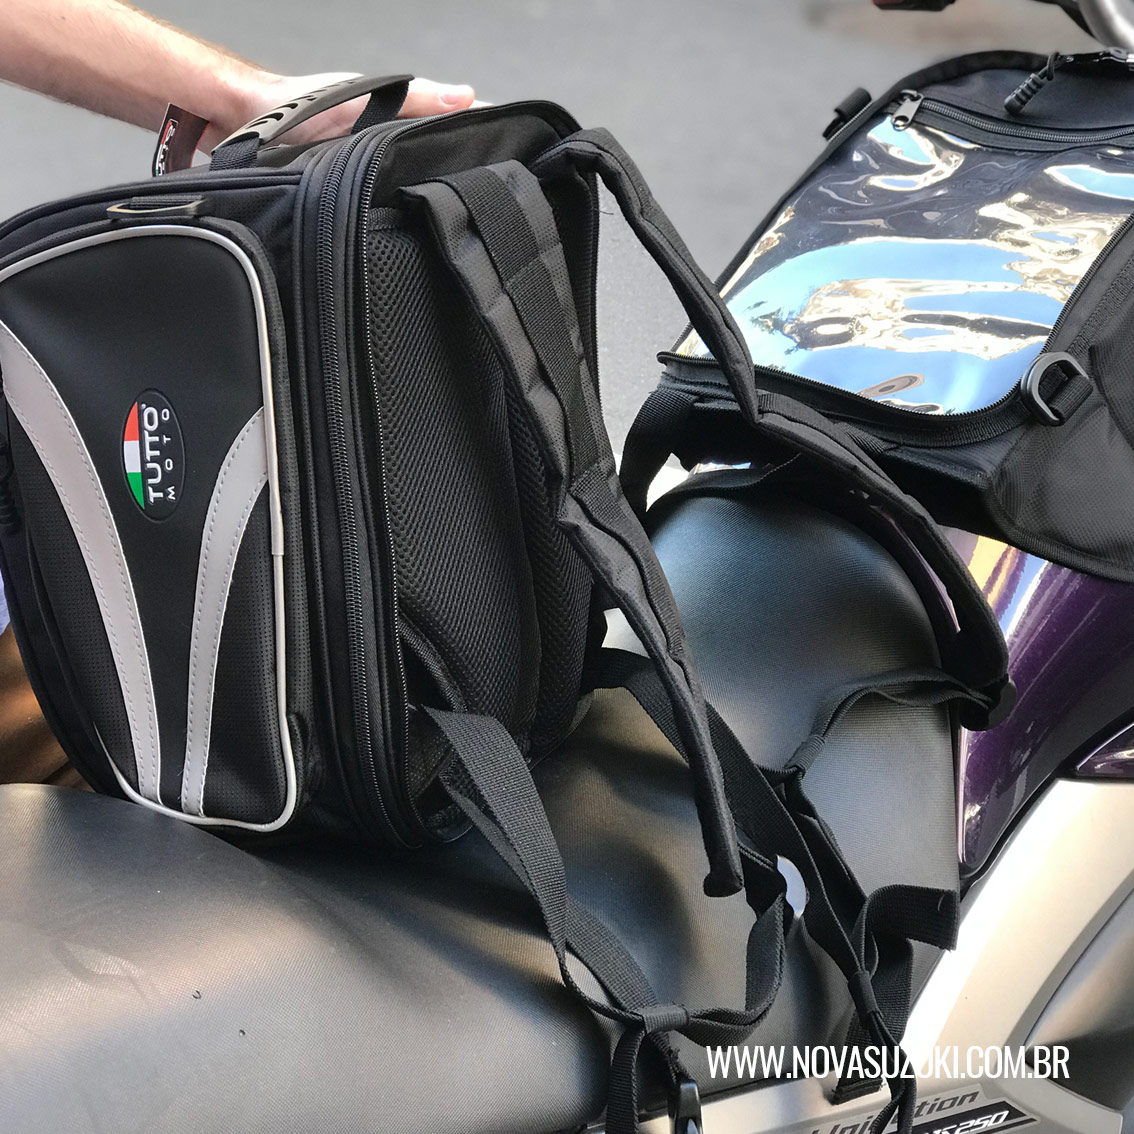 Bolsa Tutto Moto Magnética p/ tanque TB03 - 18LT Expansível (Mochila / Bolsa Traseira) - Super Queima - Givi  - Nova Suzuki Motos e Acessórios